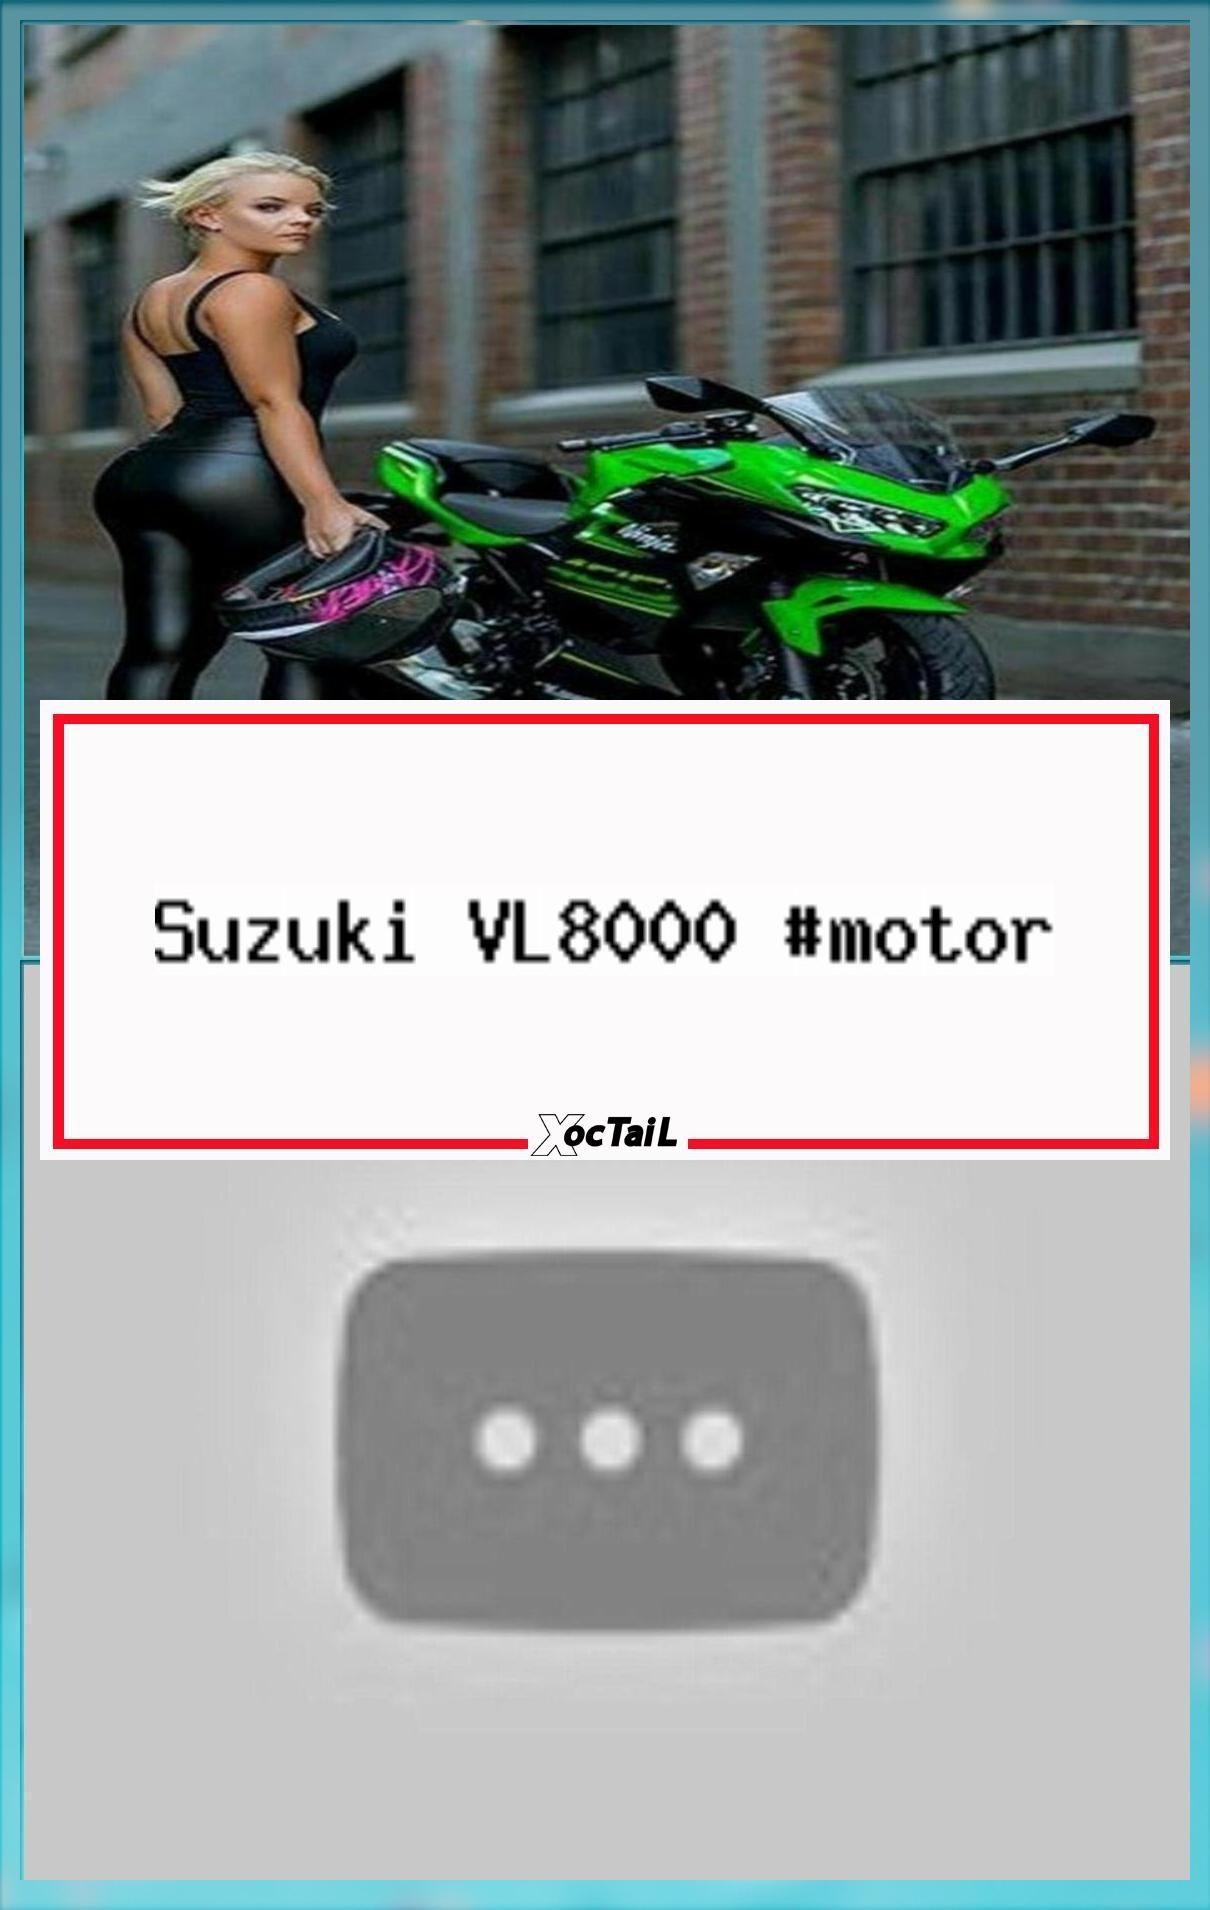 Suzuki VL8000 #motor #motorcycle #motorchick  Motorcycle  – motorcycle ride ridi…